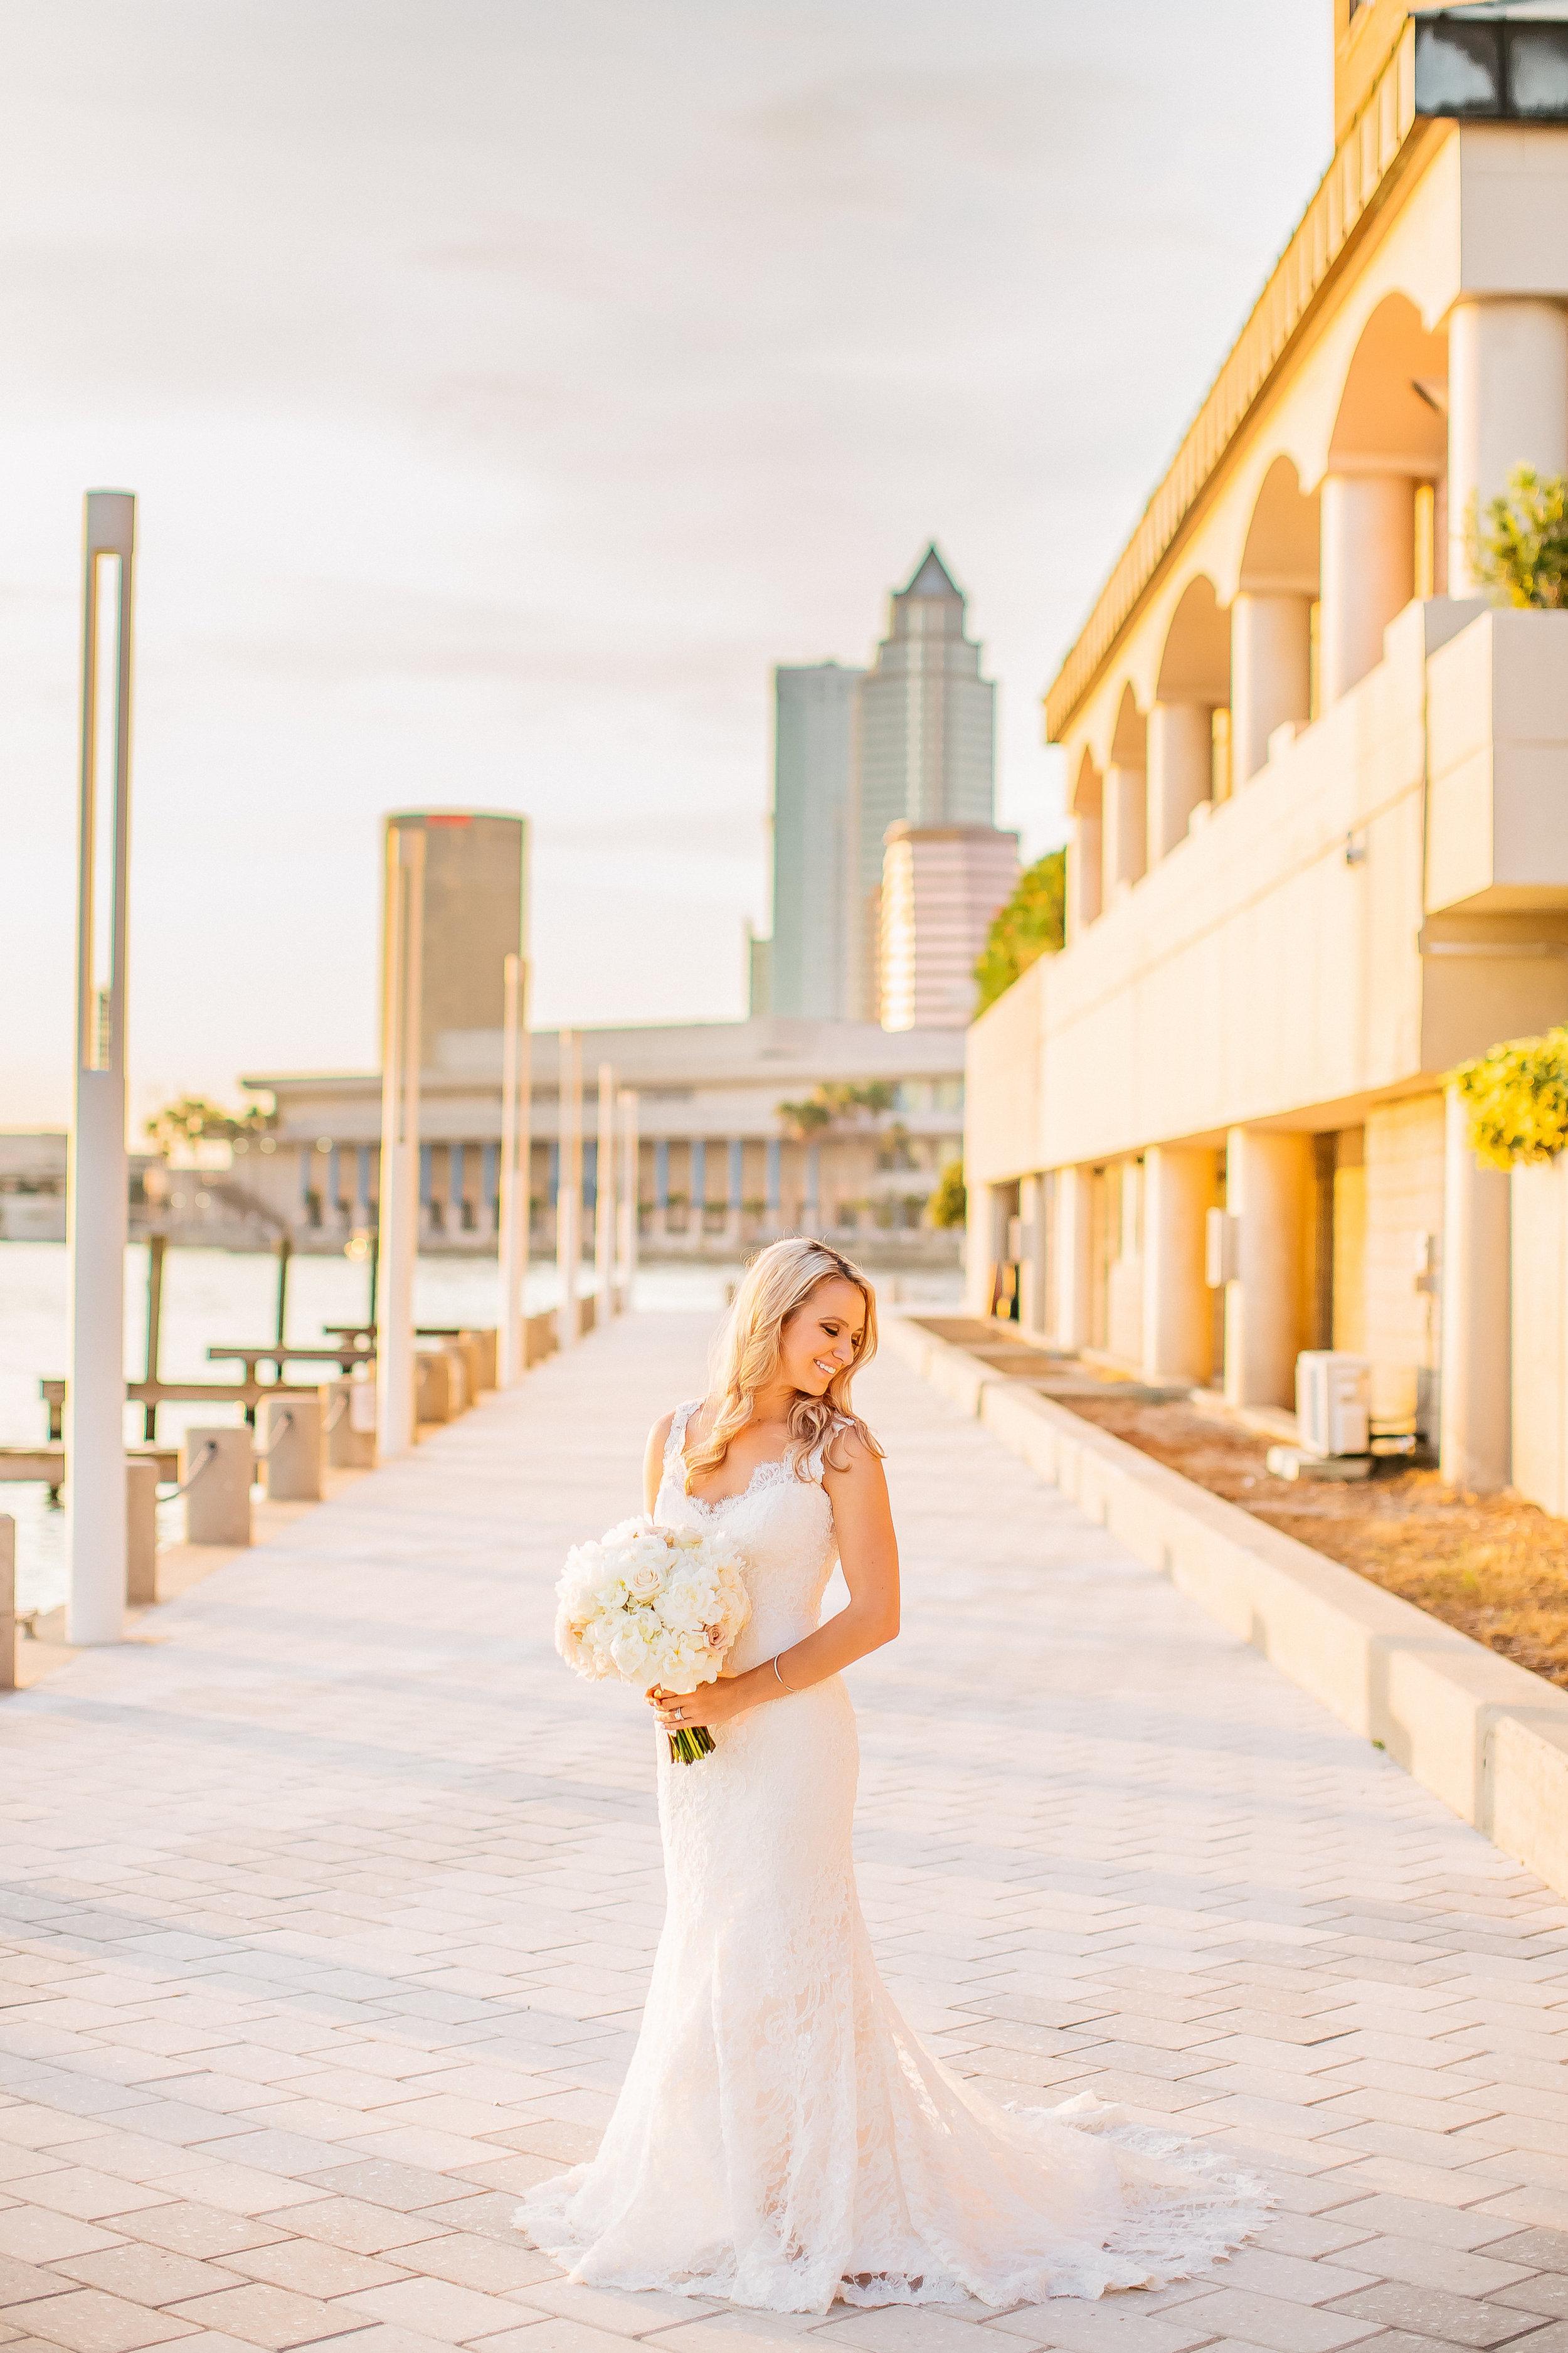 Roberts Wedding-Roberts Wedding 2016 JPEG-0406.jpeg